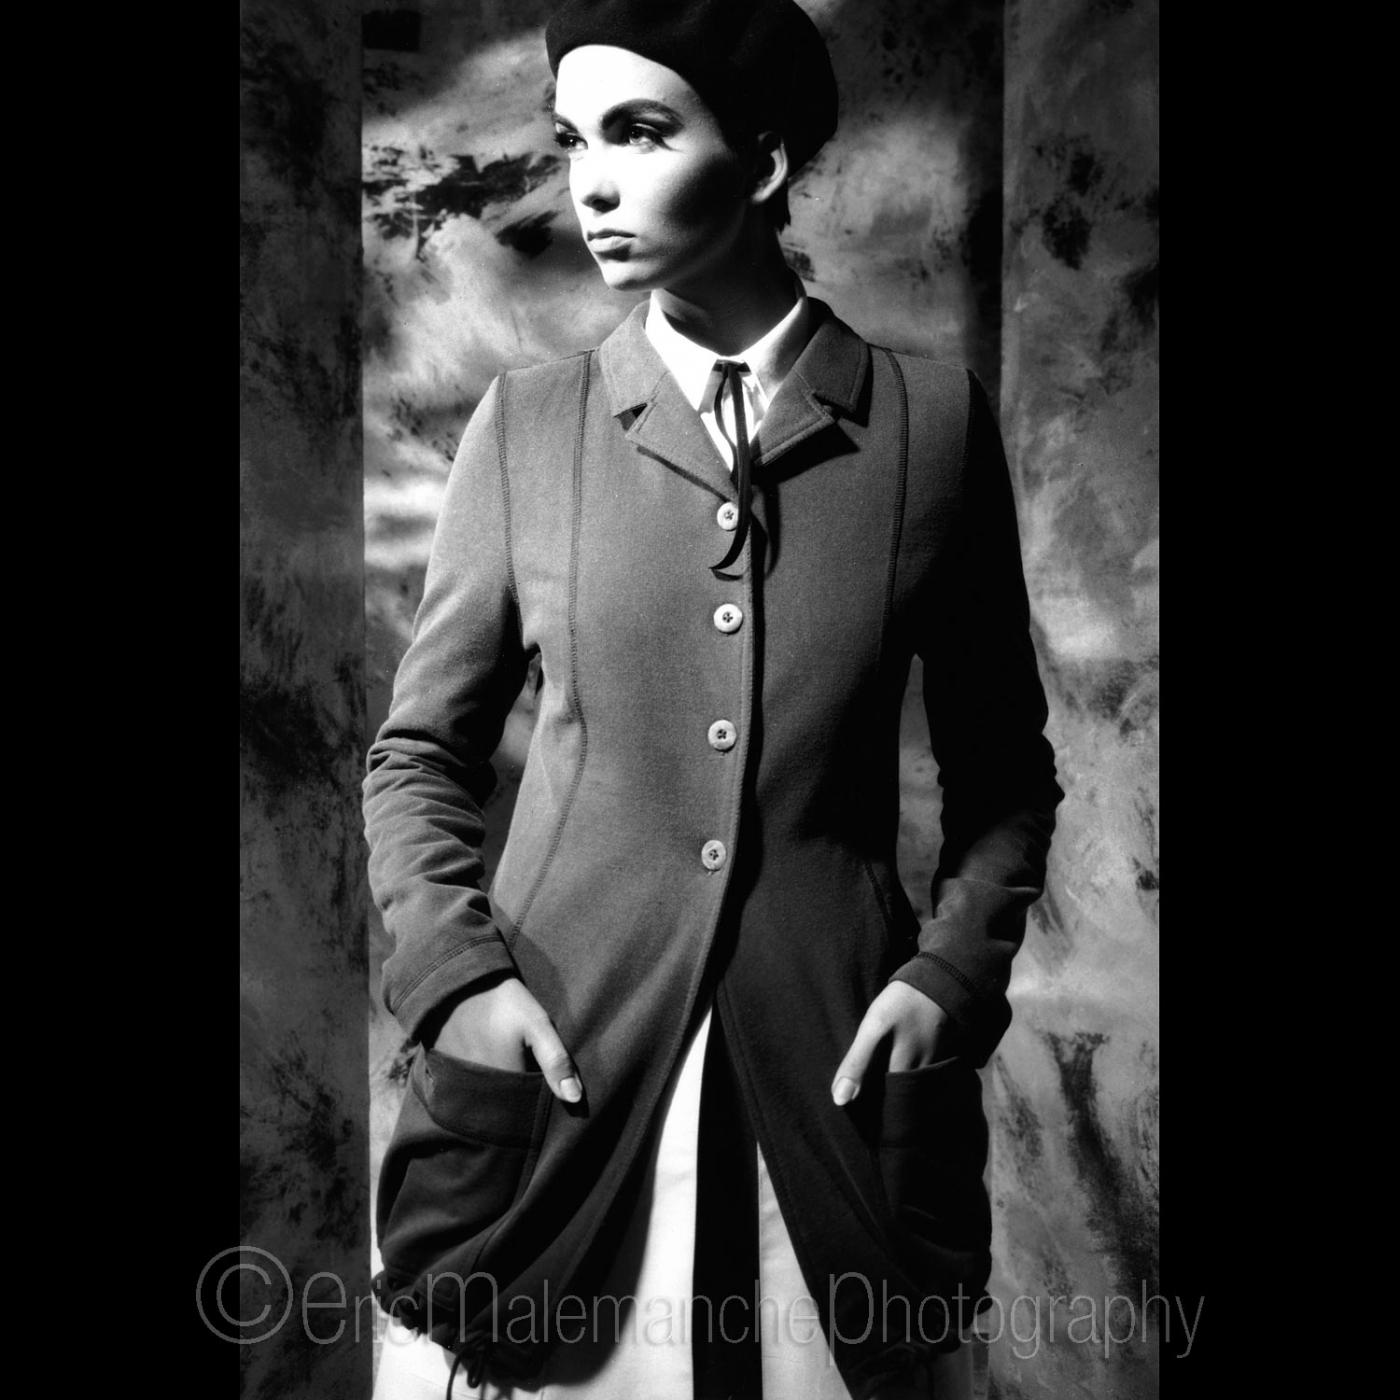 https://www.ericmalemanche.com/imagess/topics/fashion-90-s/liste/Fashion-Carbur-02.jpg